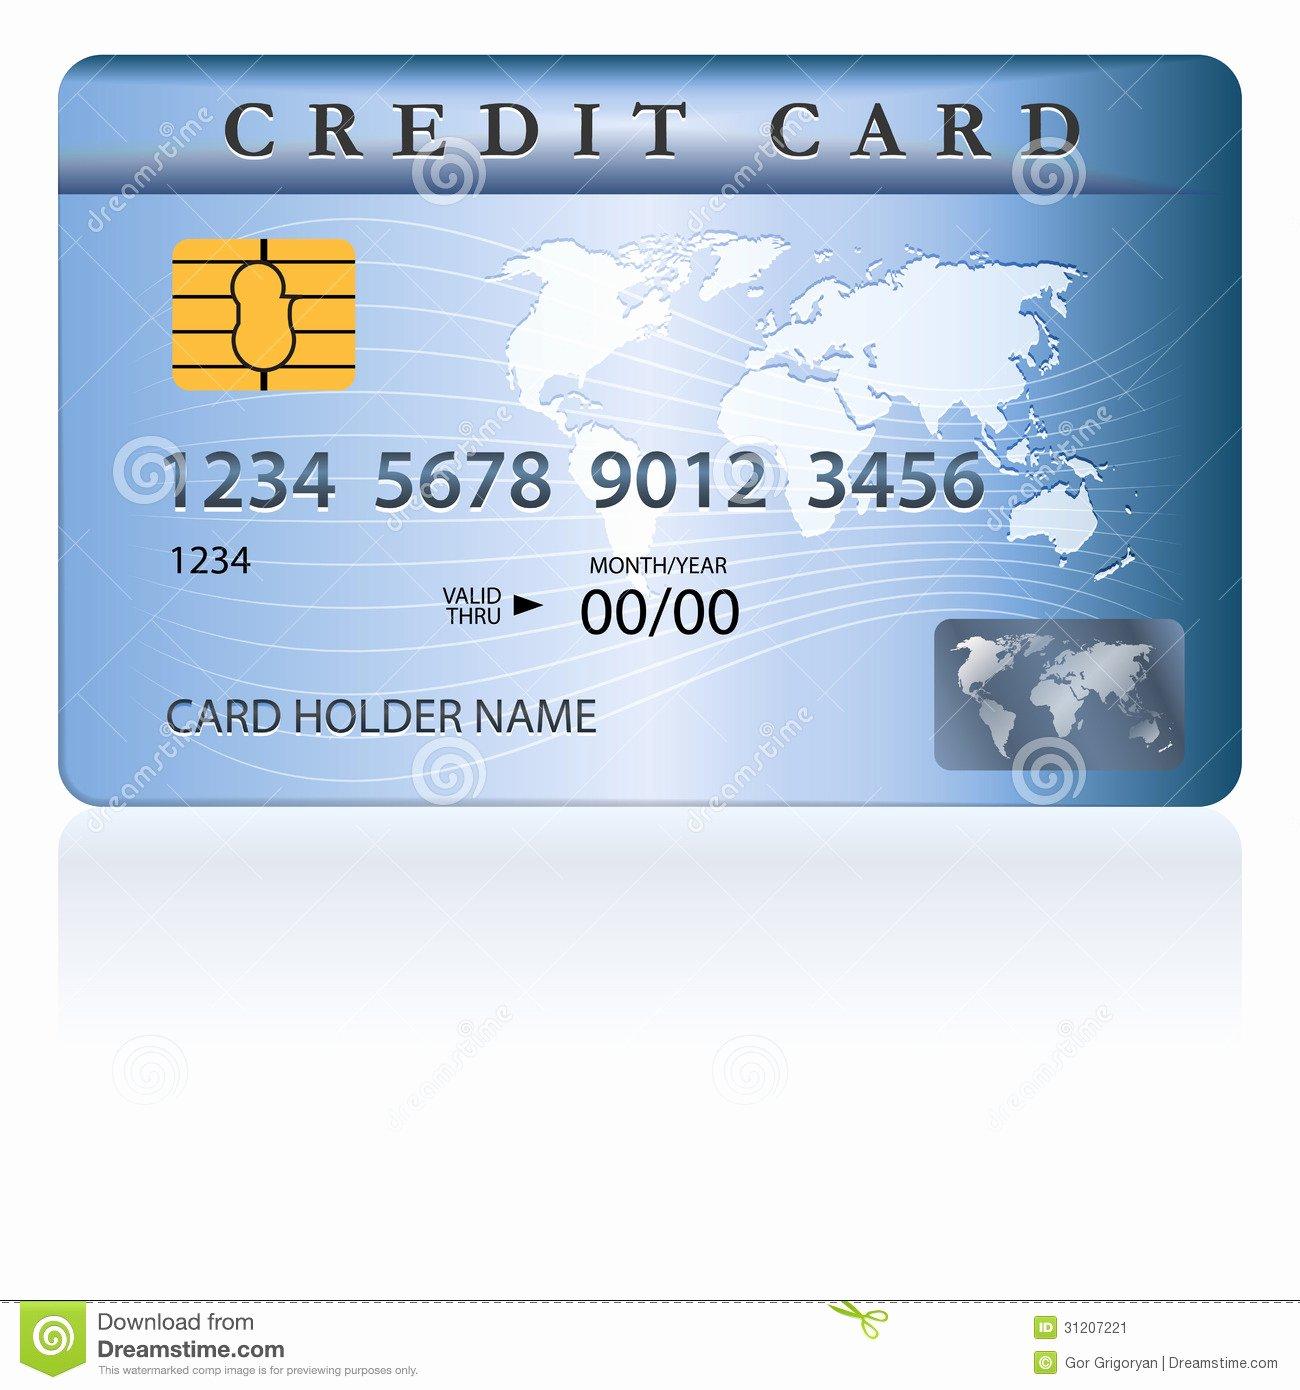 Credit Card Design Template Lovely Credit Debit Card Design Stock Vector Illustration Of